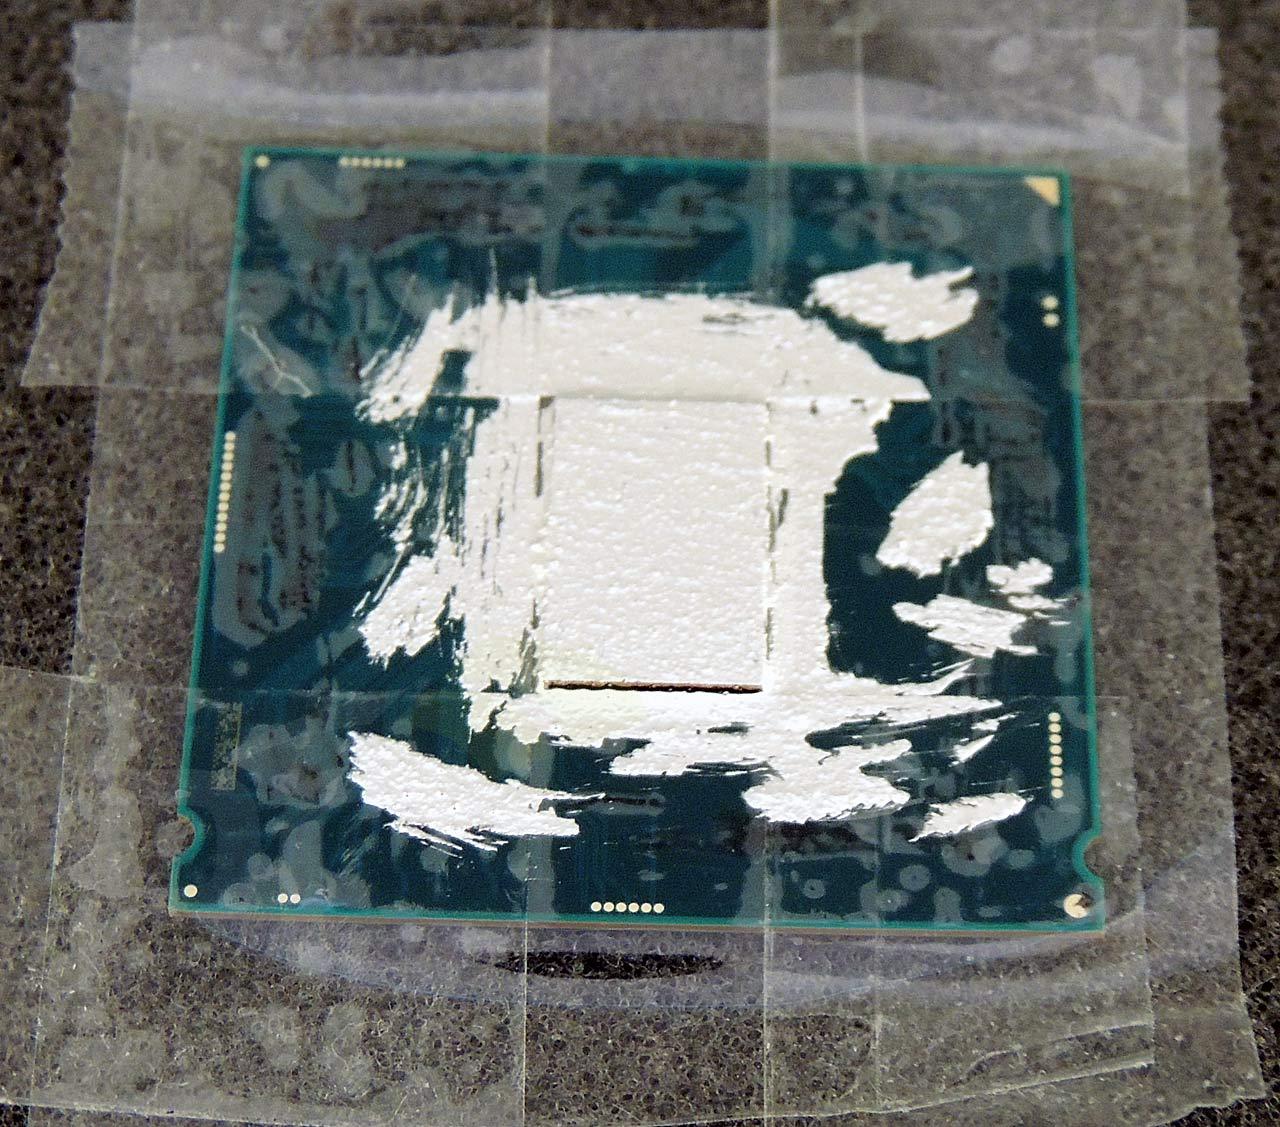 08-cpu-naked-liquid-metal-application.jpg